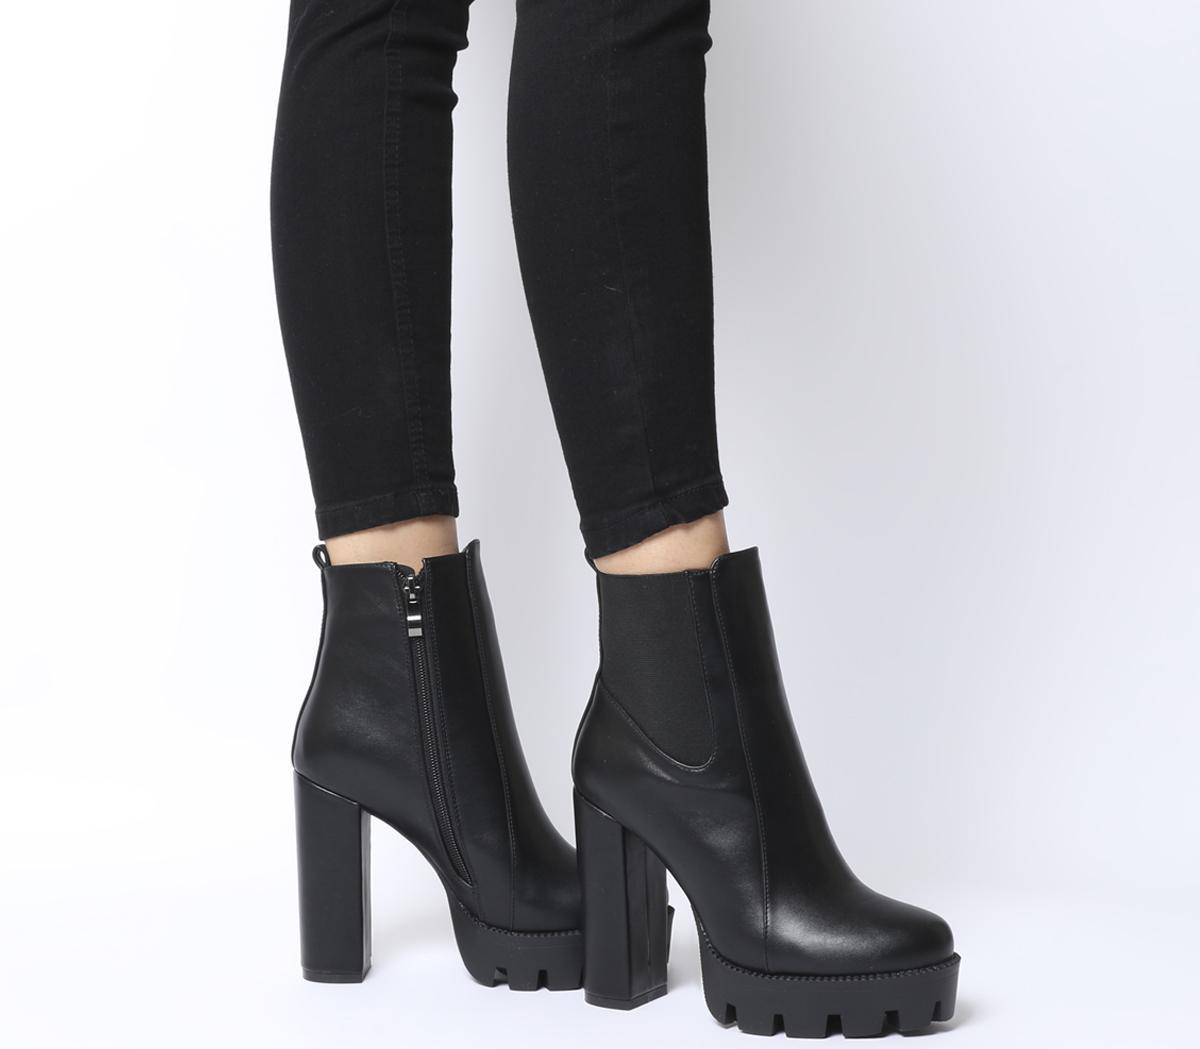 Ego Atlas Heeled Boots Black Pu - Ankle